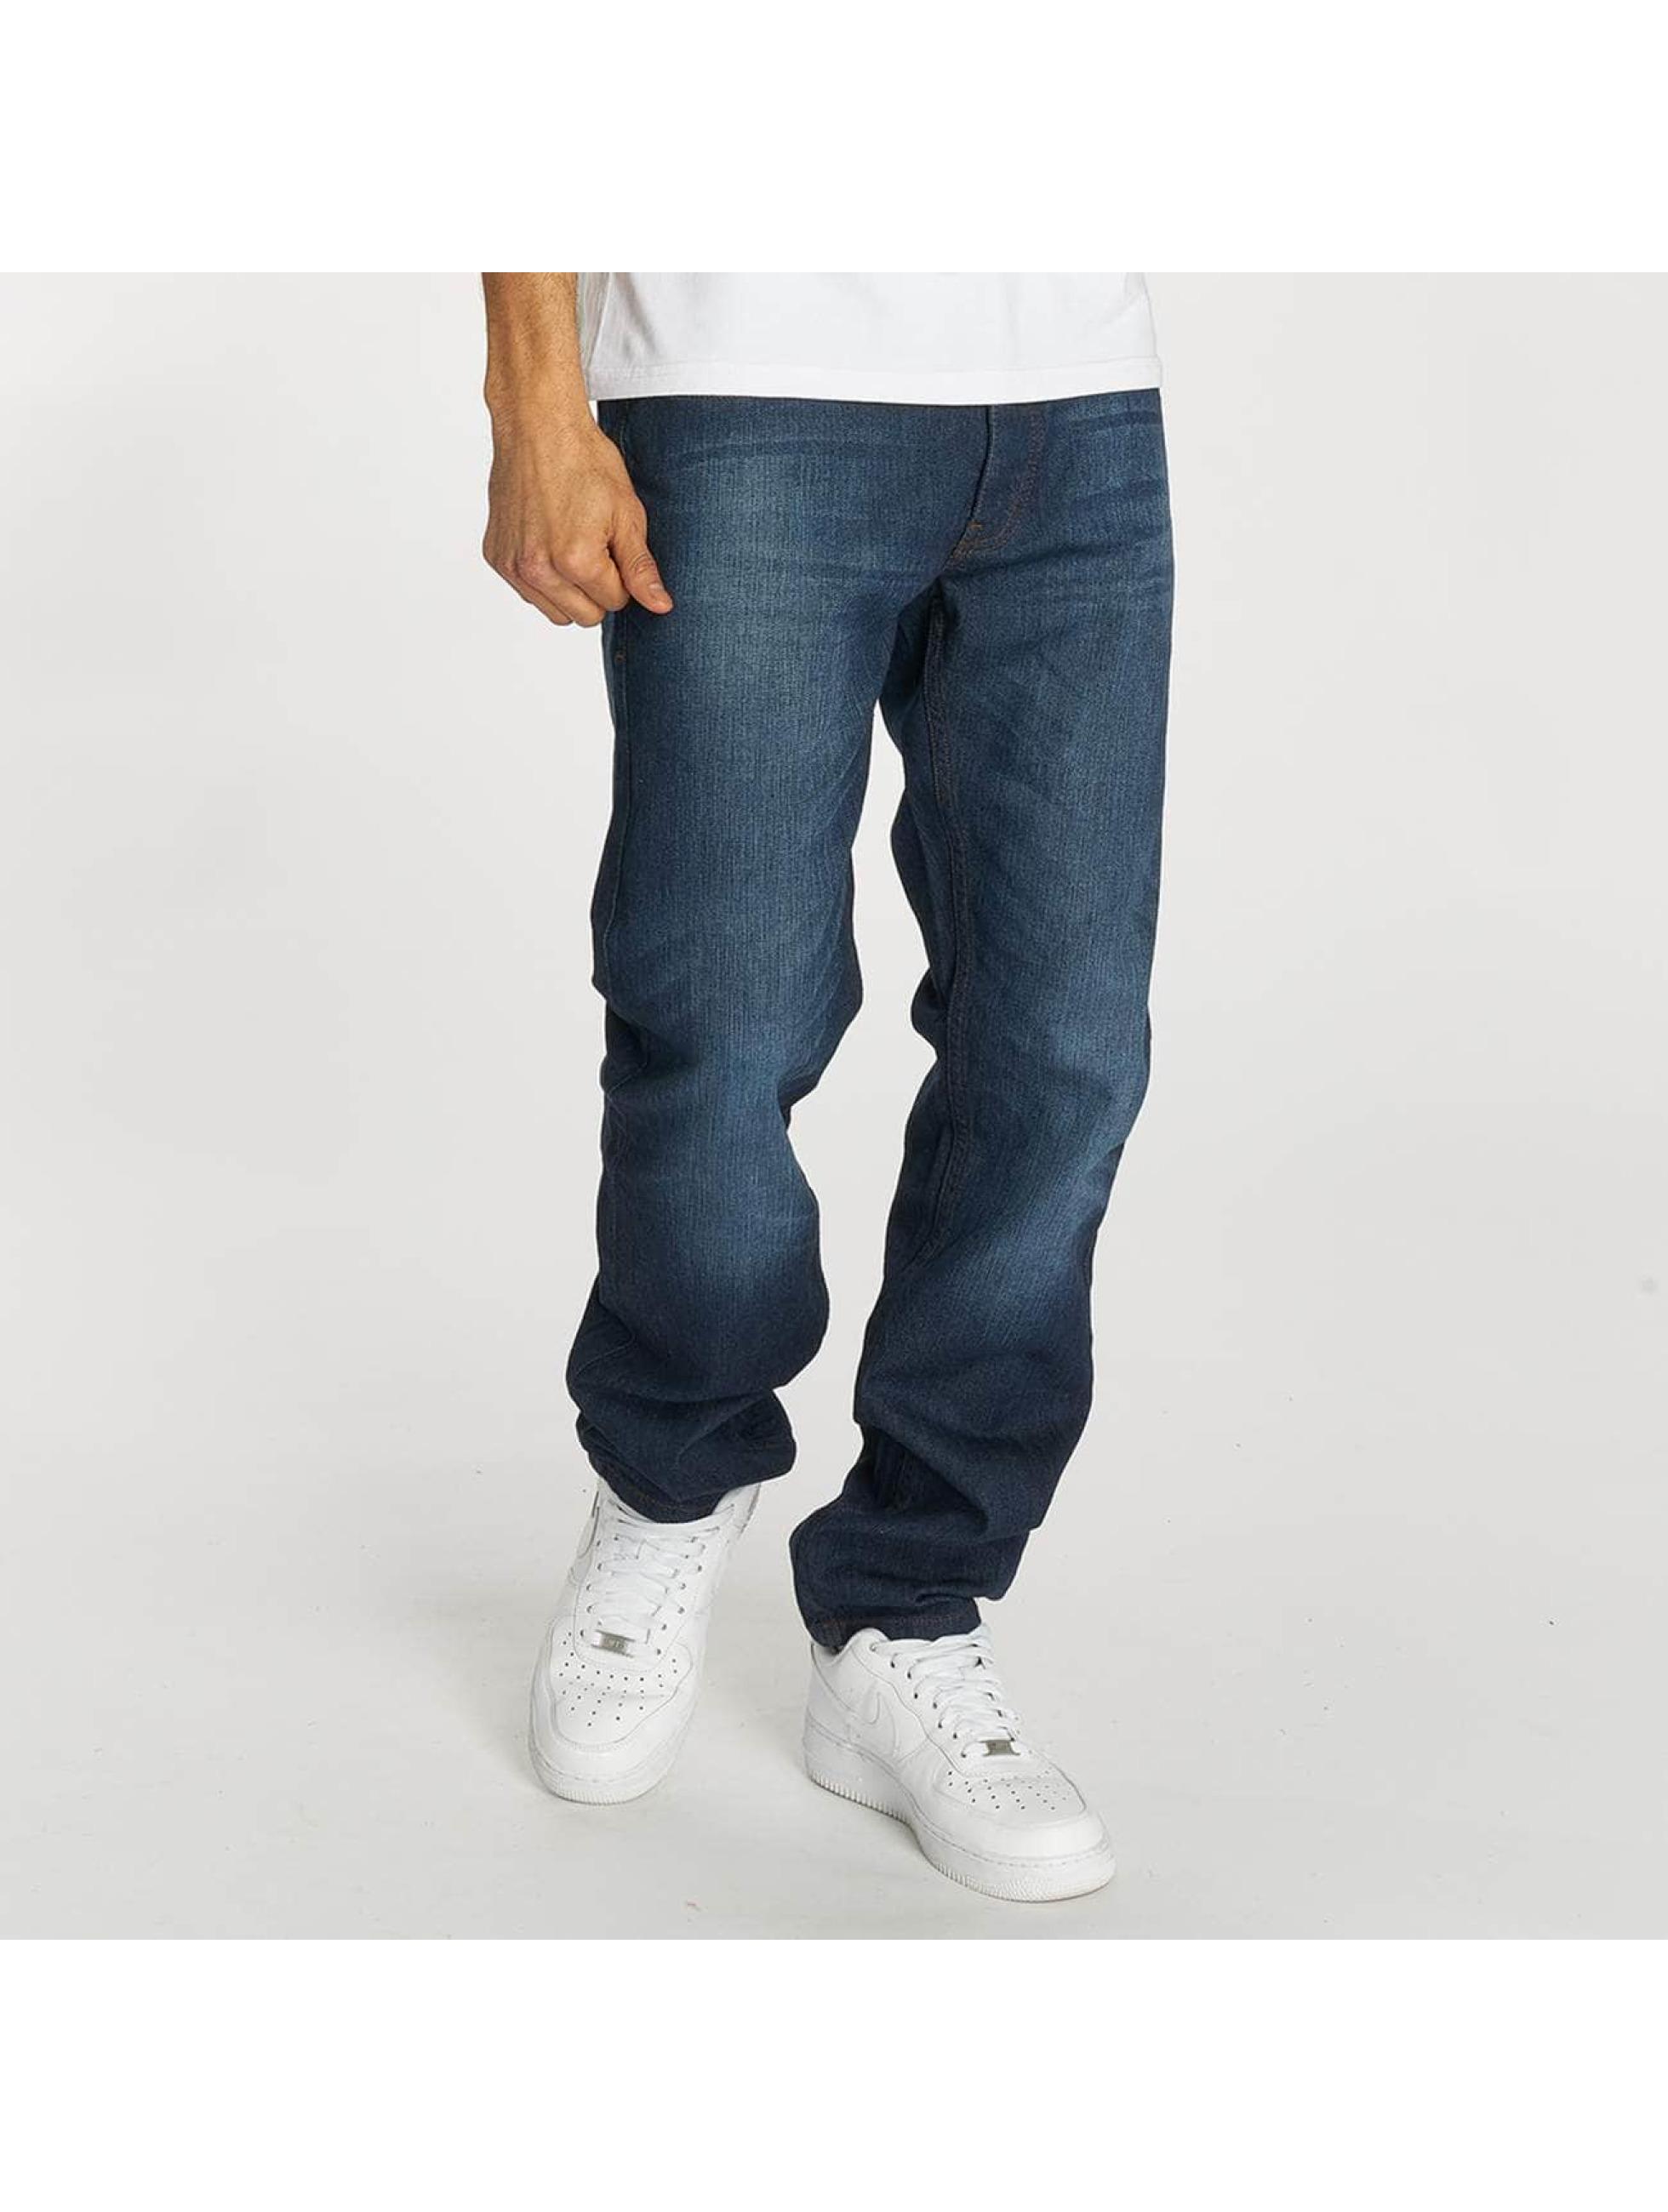 Rocawear / Straight Fit Jeans Moletro in blue W 46